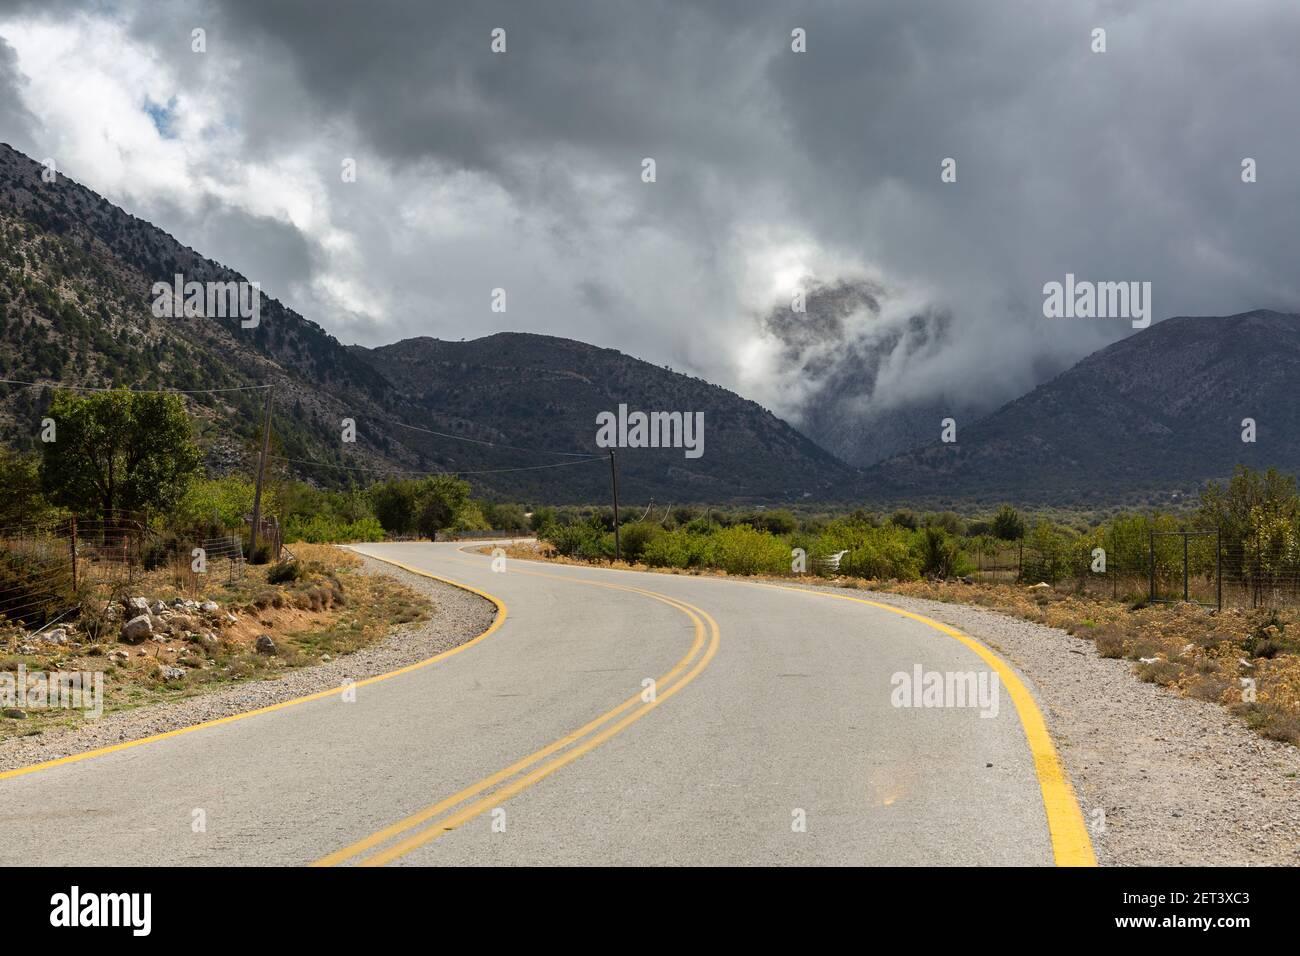 Dramatic clouds over a road and mountainous landscape near the Samaria Gorge trailhead, Crete, Greece Stock Photo